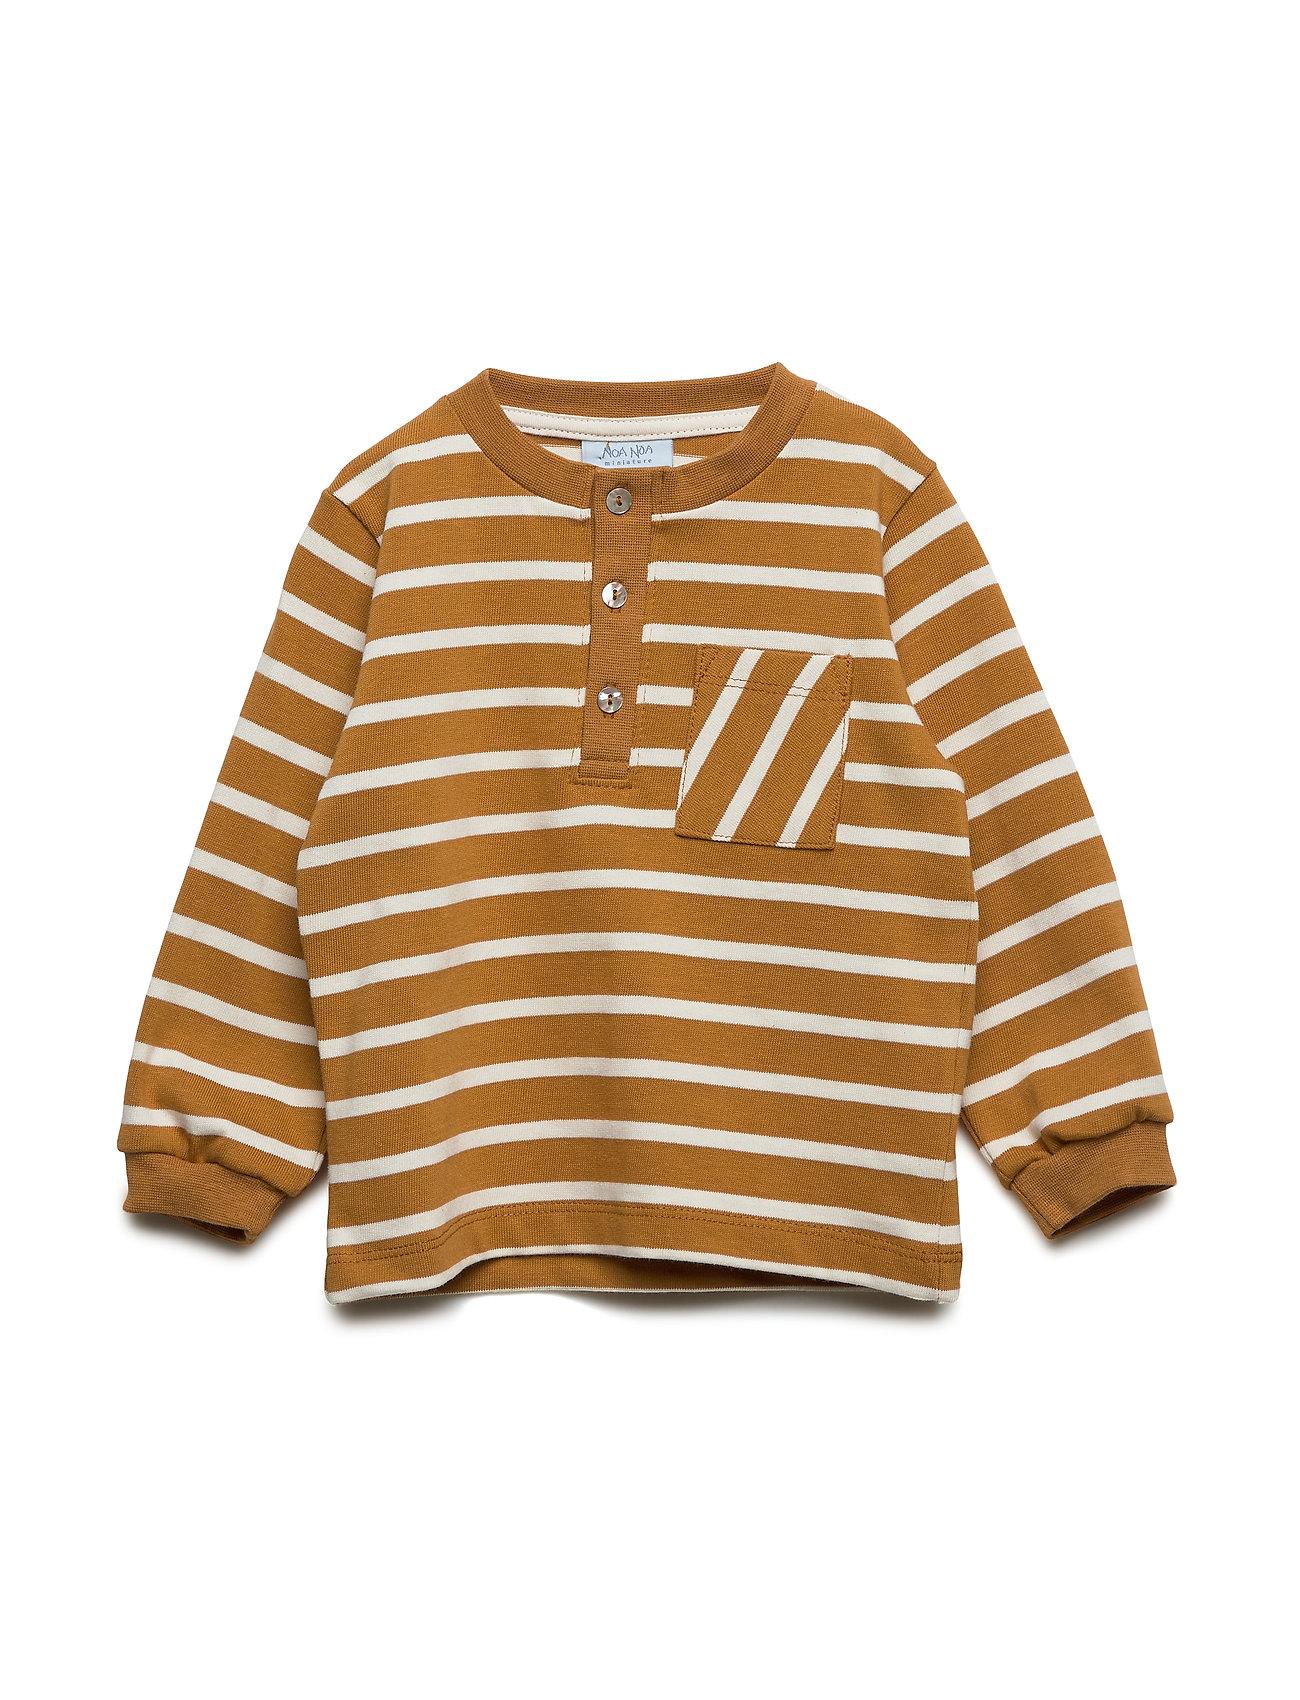 Noa Noa Miniature Sweatshirt - SUDAN BROWN